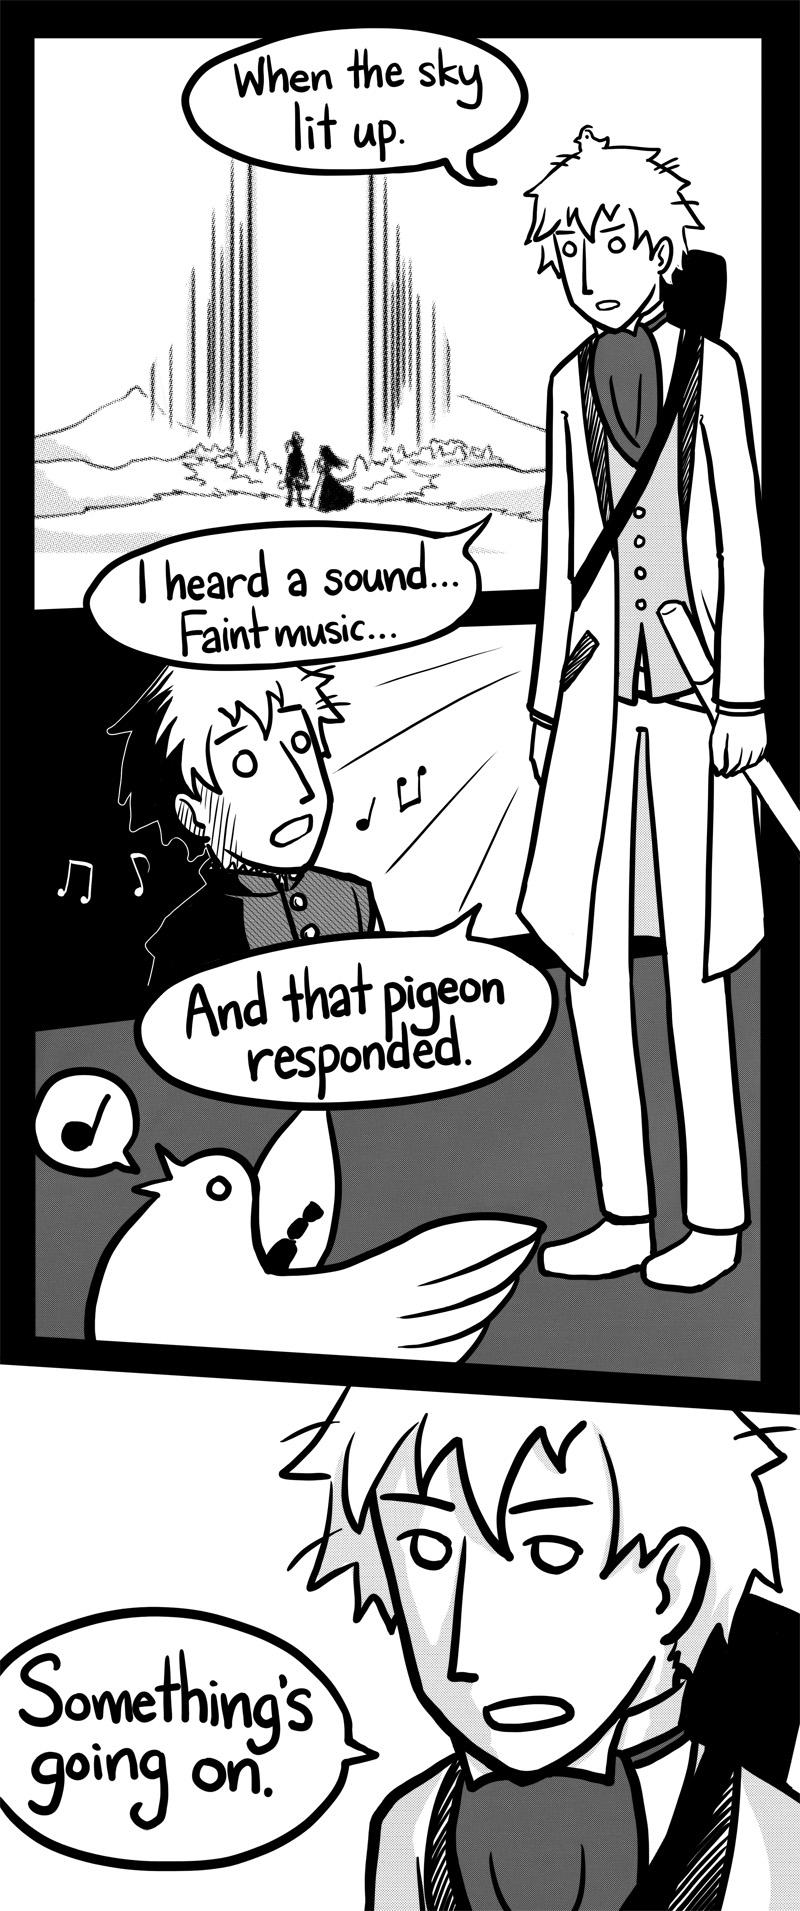 That Pigeon